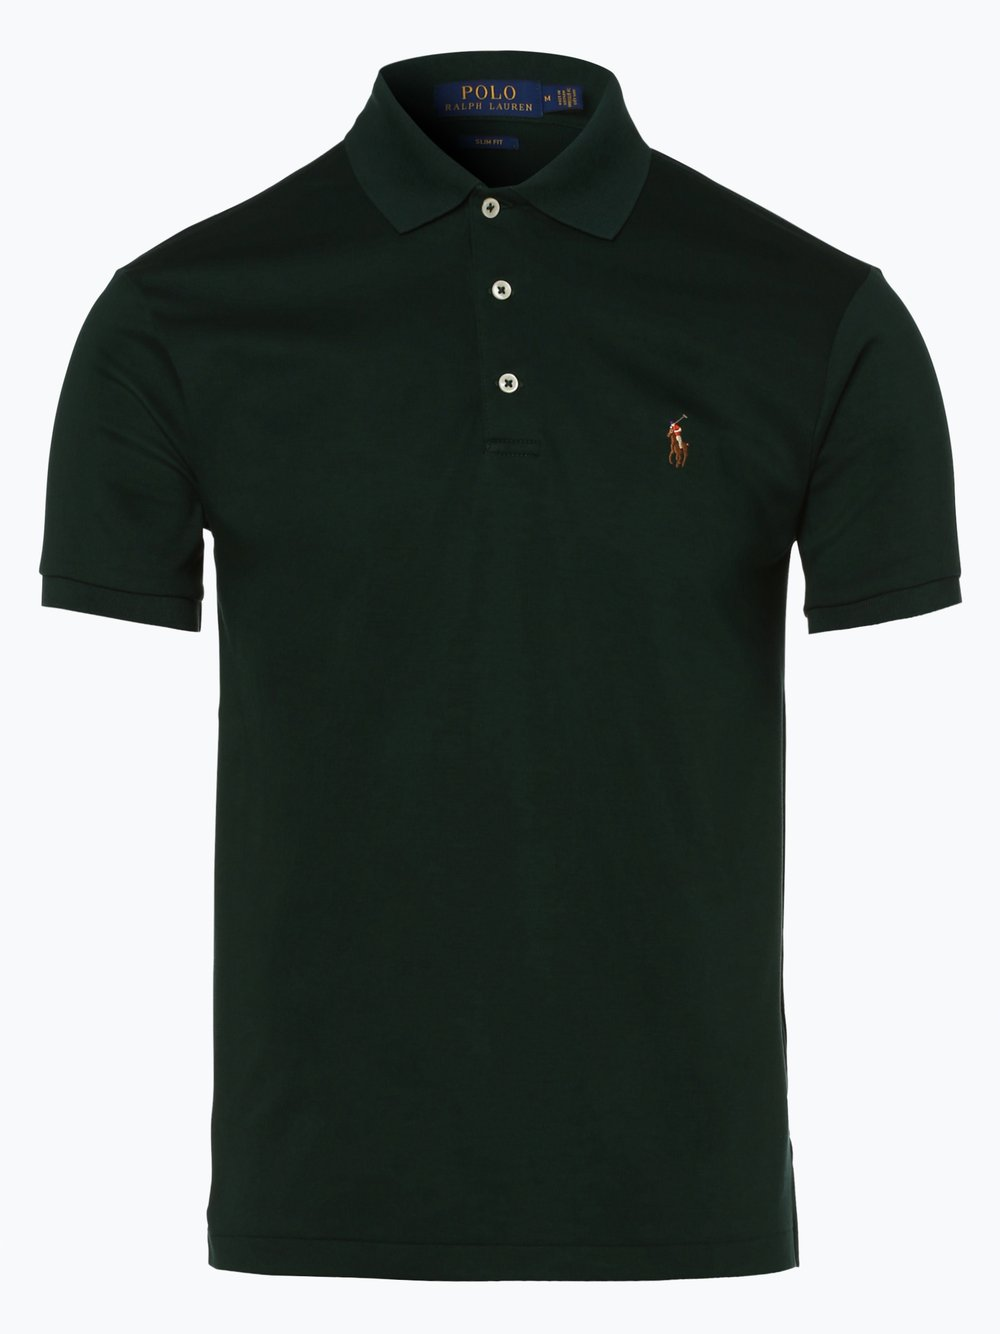 30ada1a356f6 Polo Ralph Lauren Herren Poloshirt Slim Fit  2  online kaufen   PEEK ...